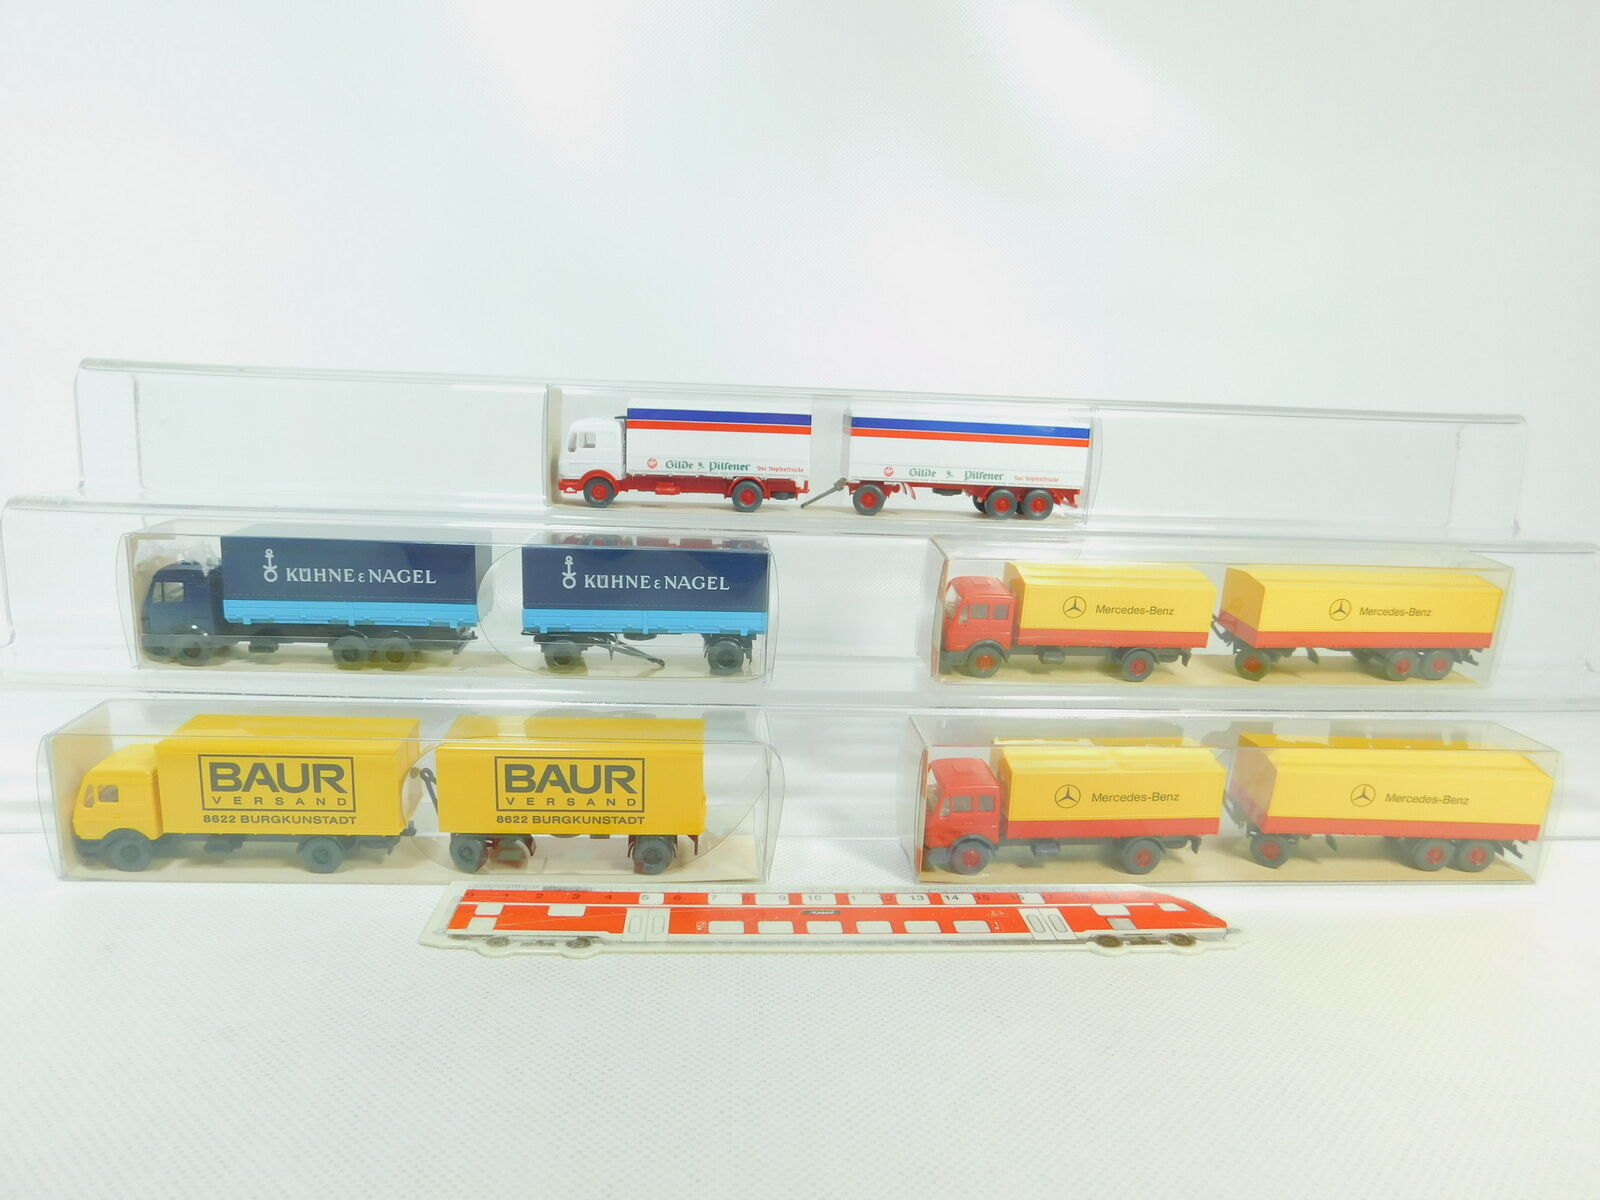 BO746-0,5x Wiking H0 1 87 Lastzug MB  456+455 Gilde+459 1 Baur+571, NEUW+OVP